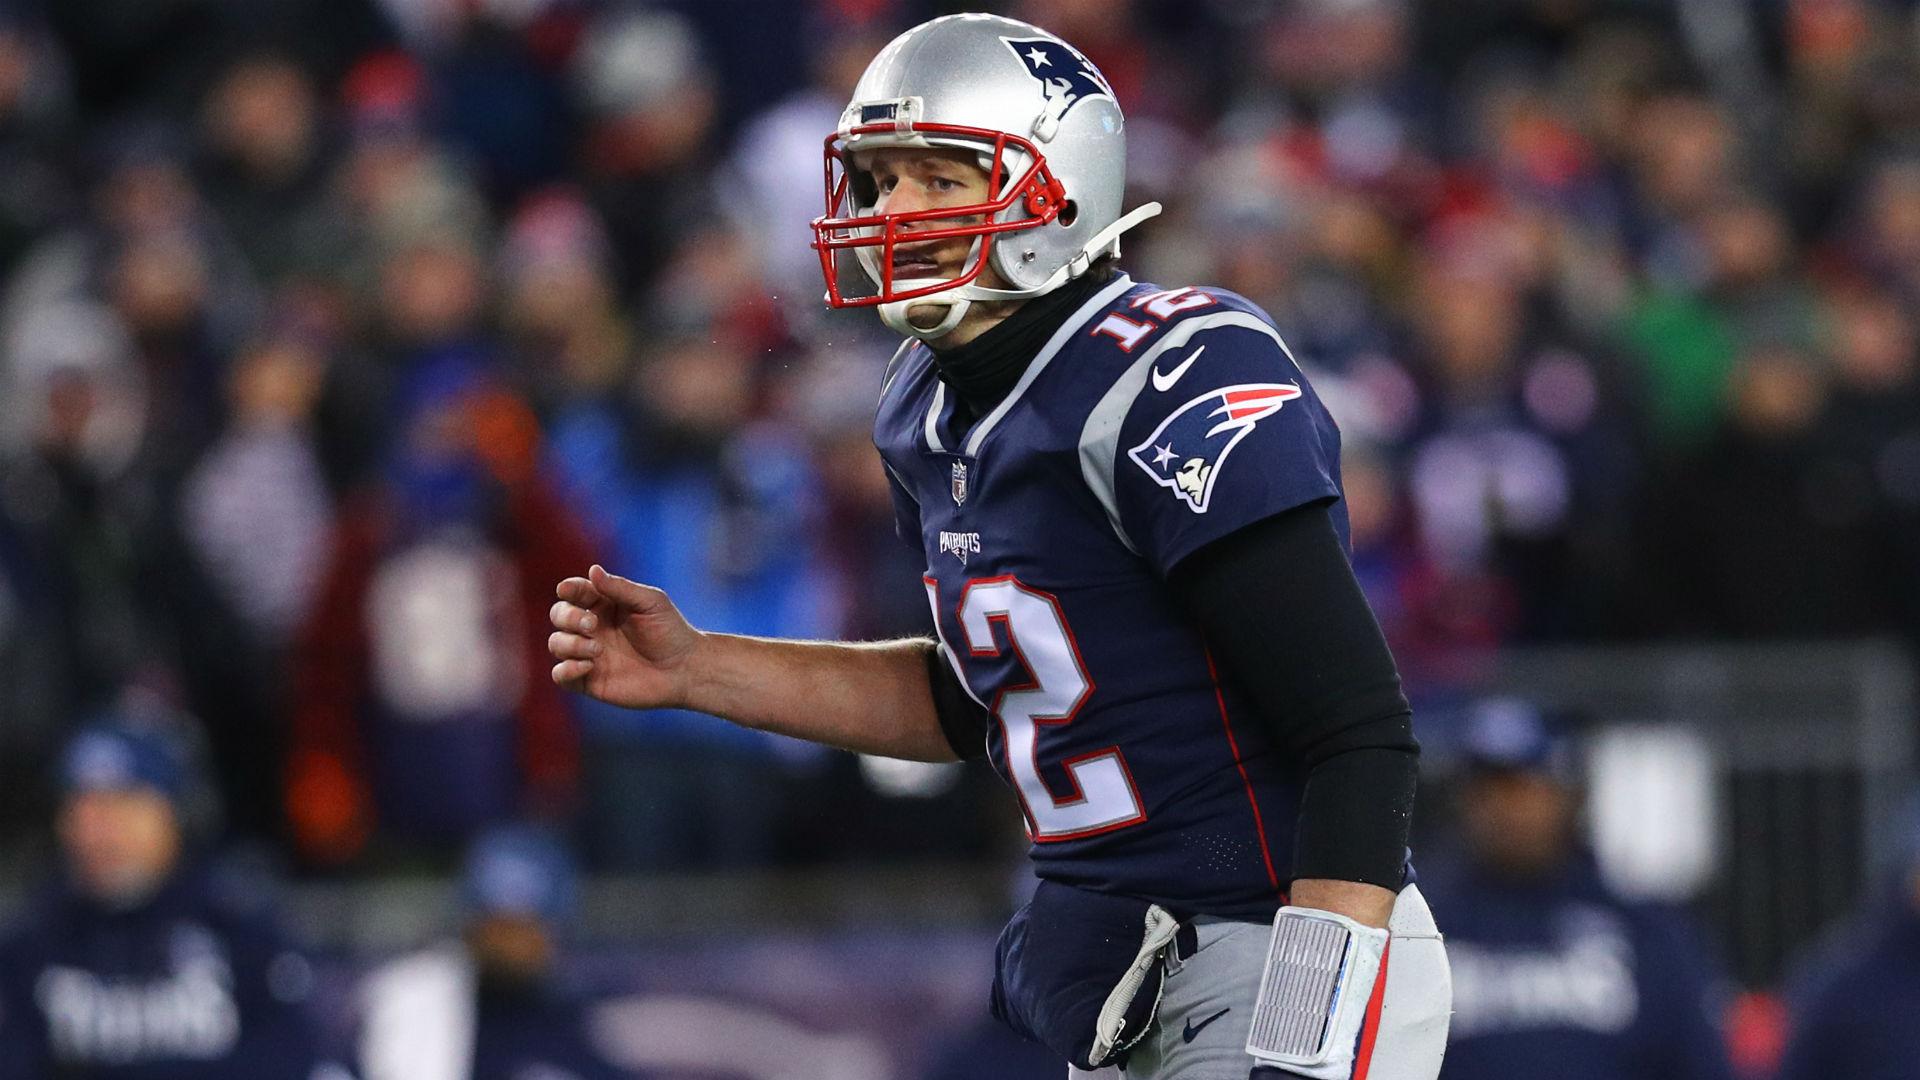 Madden NFL 18 Predicts New England Patriots Win Super Bowl 52